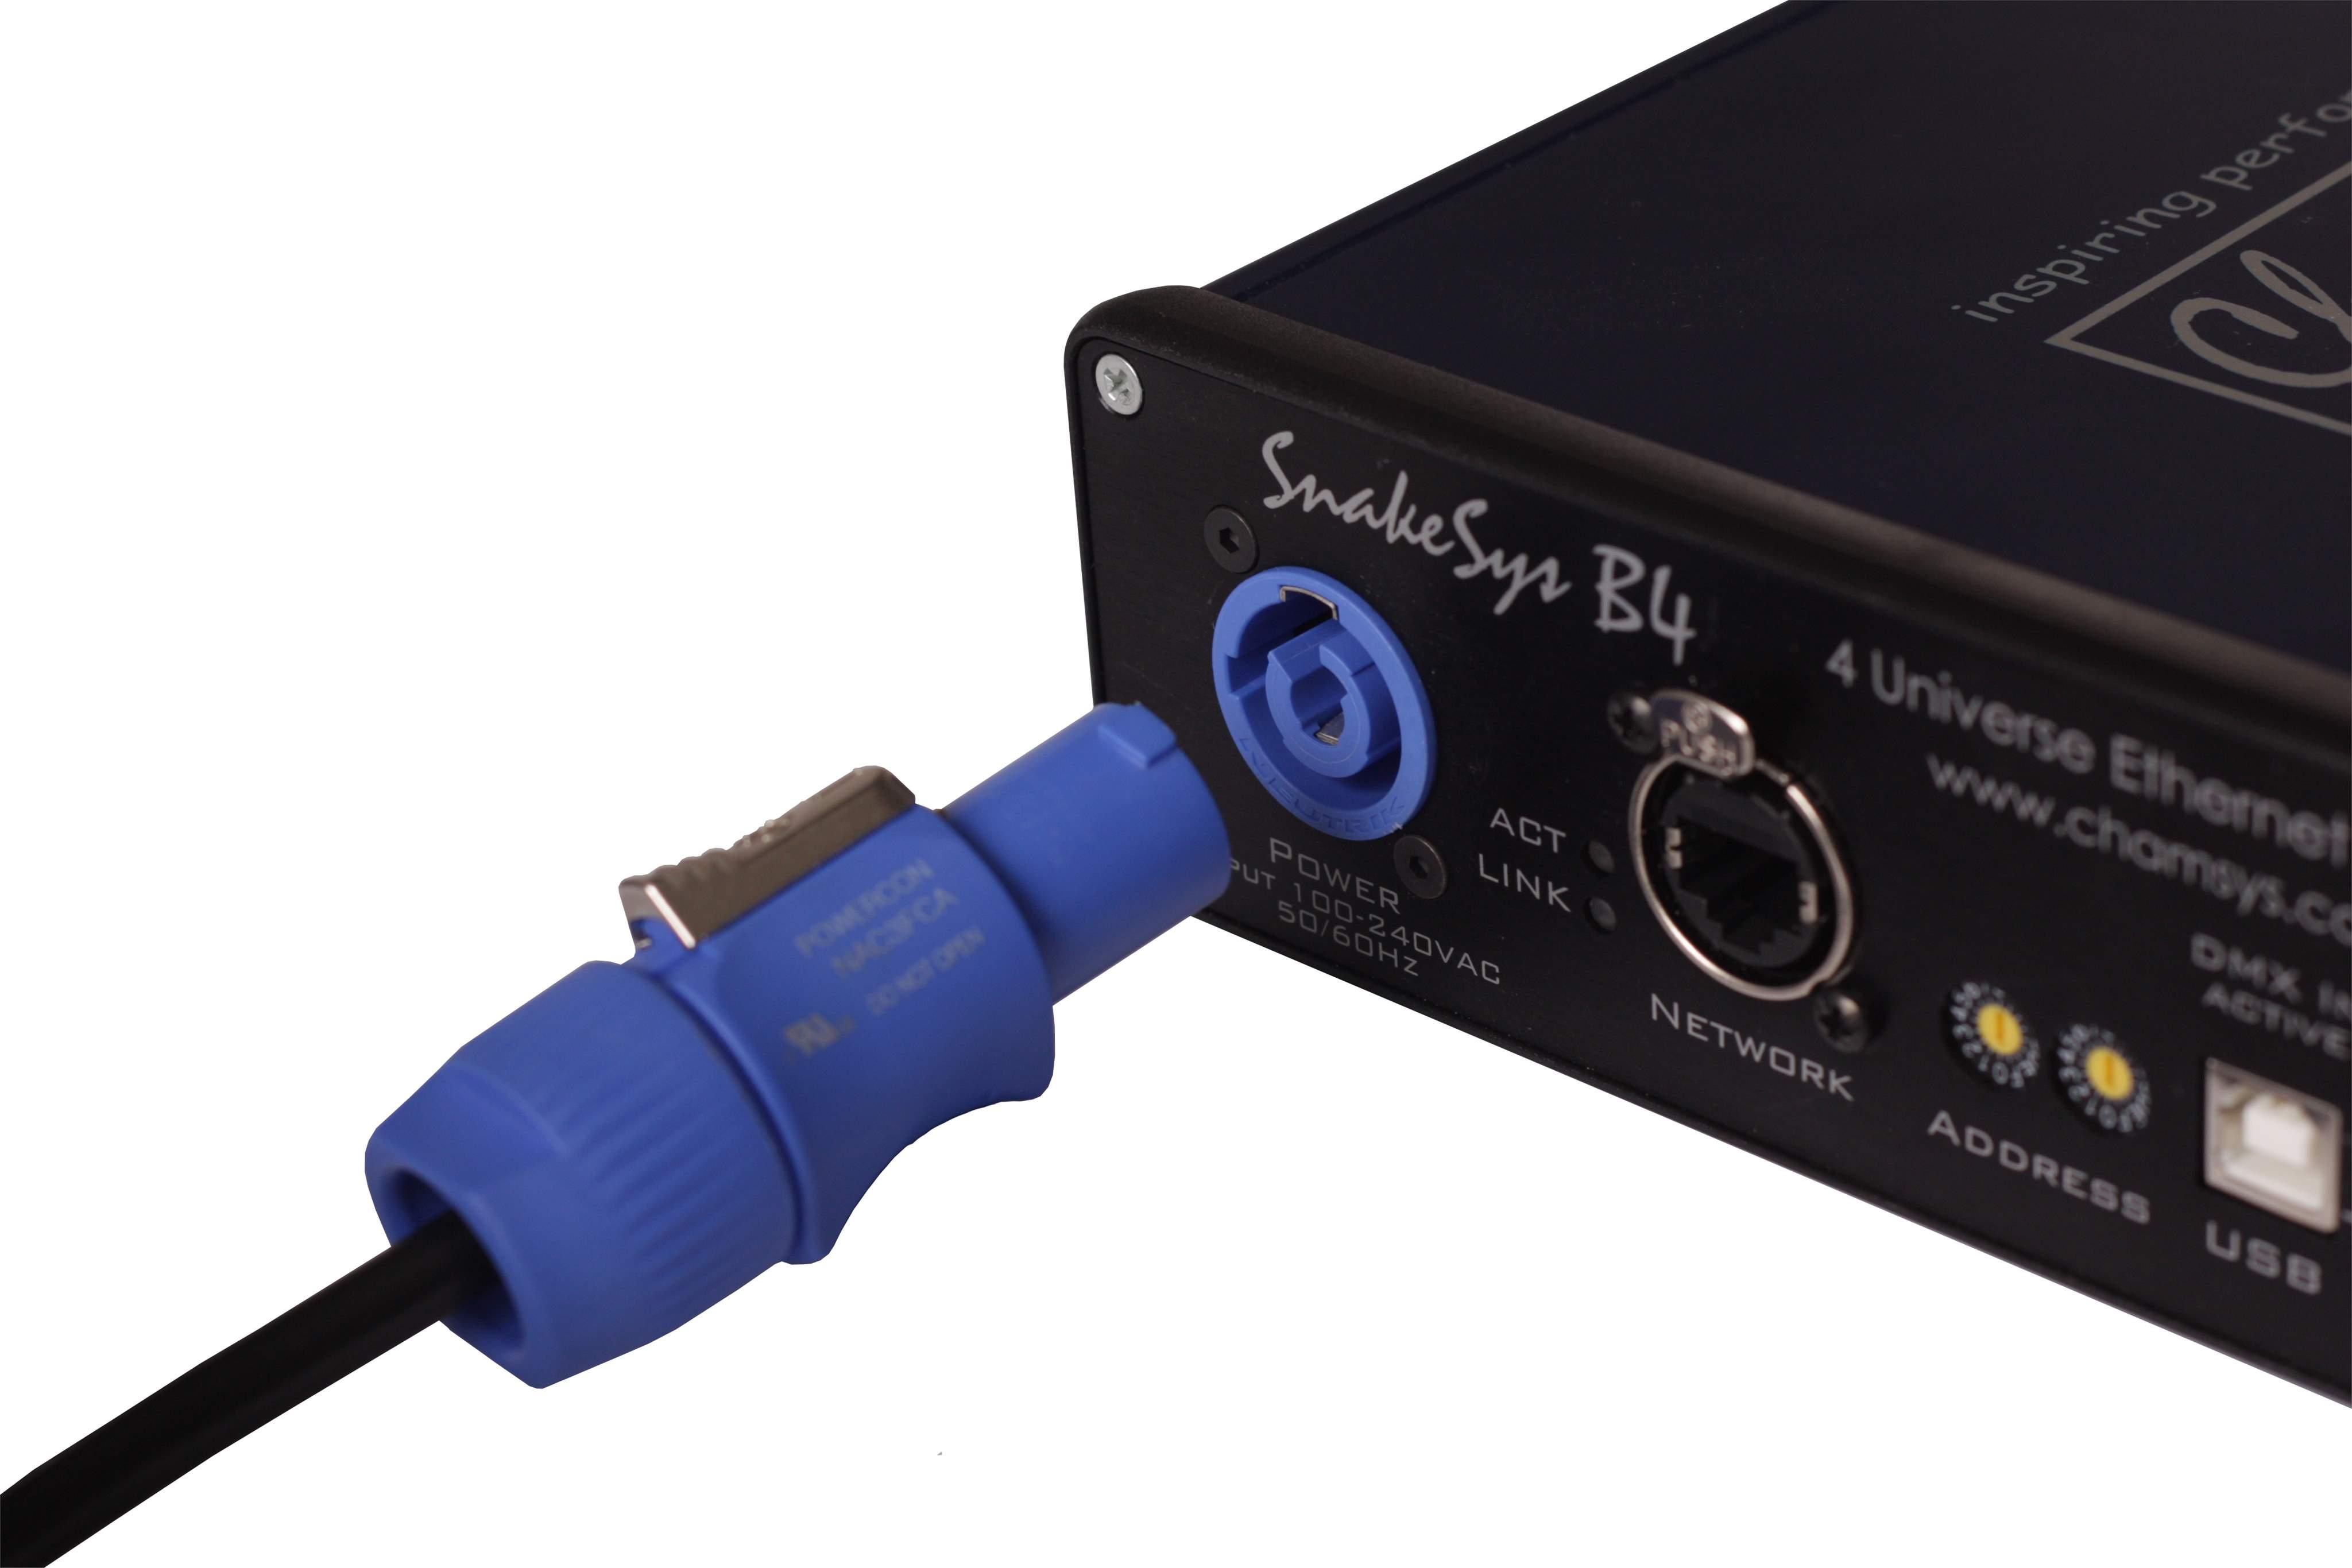 CHAMSYS SnakeSys B4 (ArtNet/DMX, 4 univ ) DMX/Ethernet Adapter